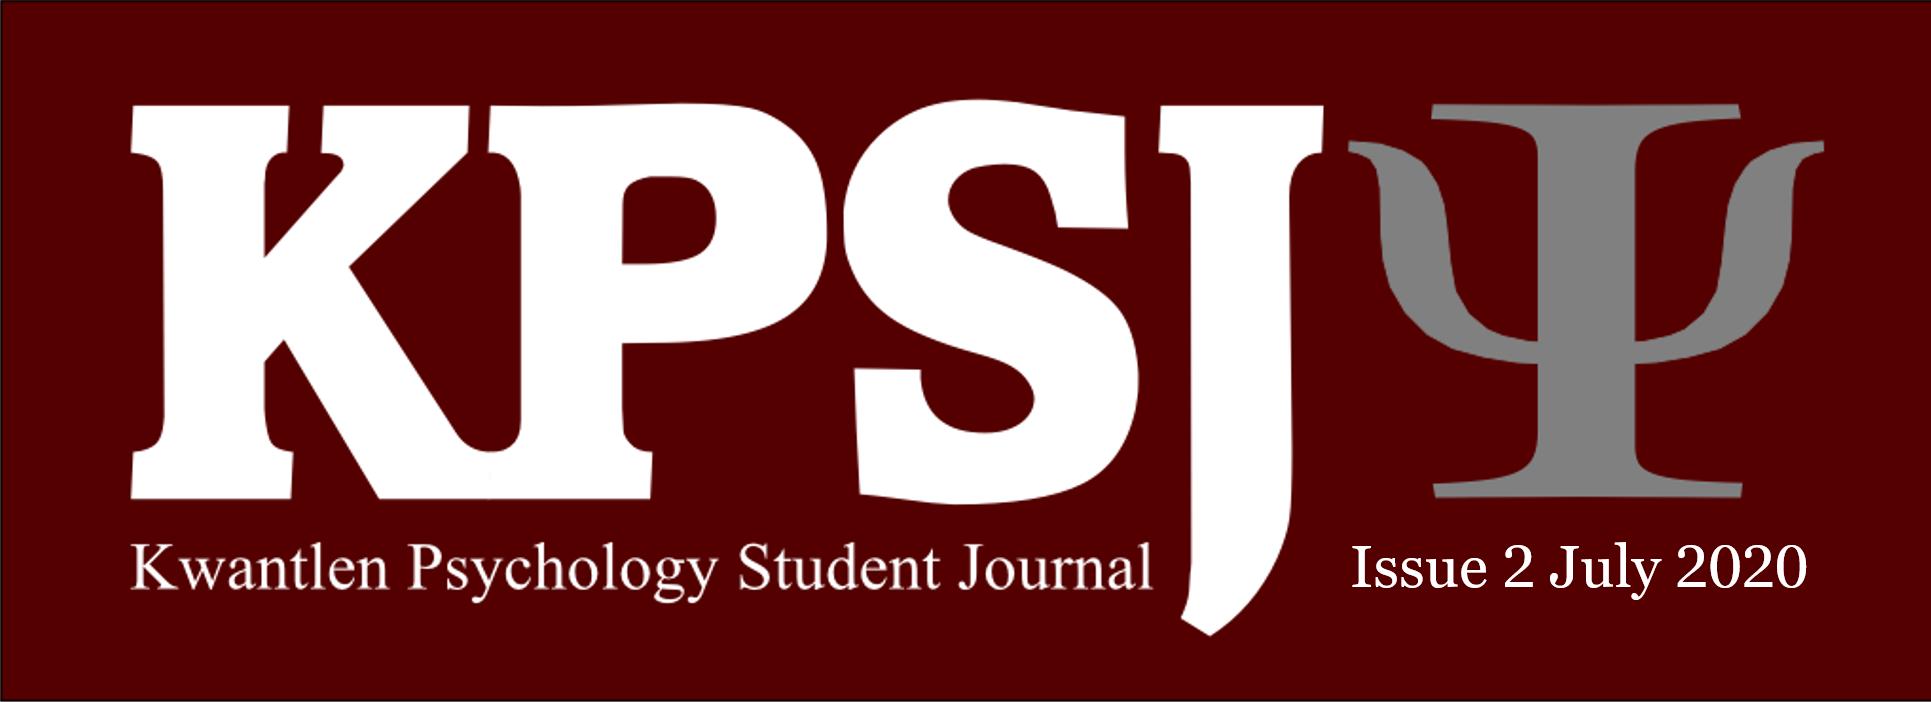 KPSJ, Kwantlen Psychology Student Journal, Issue 2, July 2020